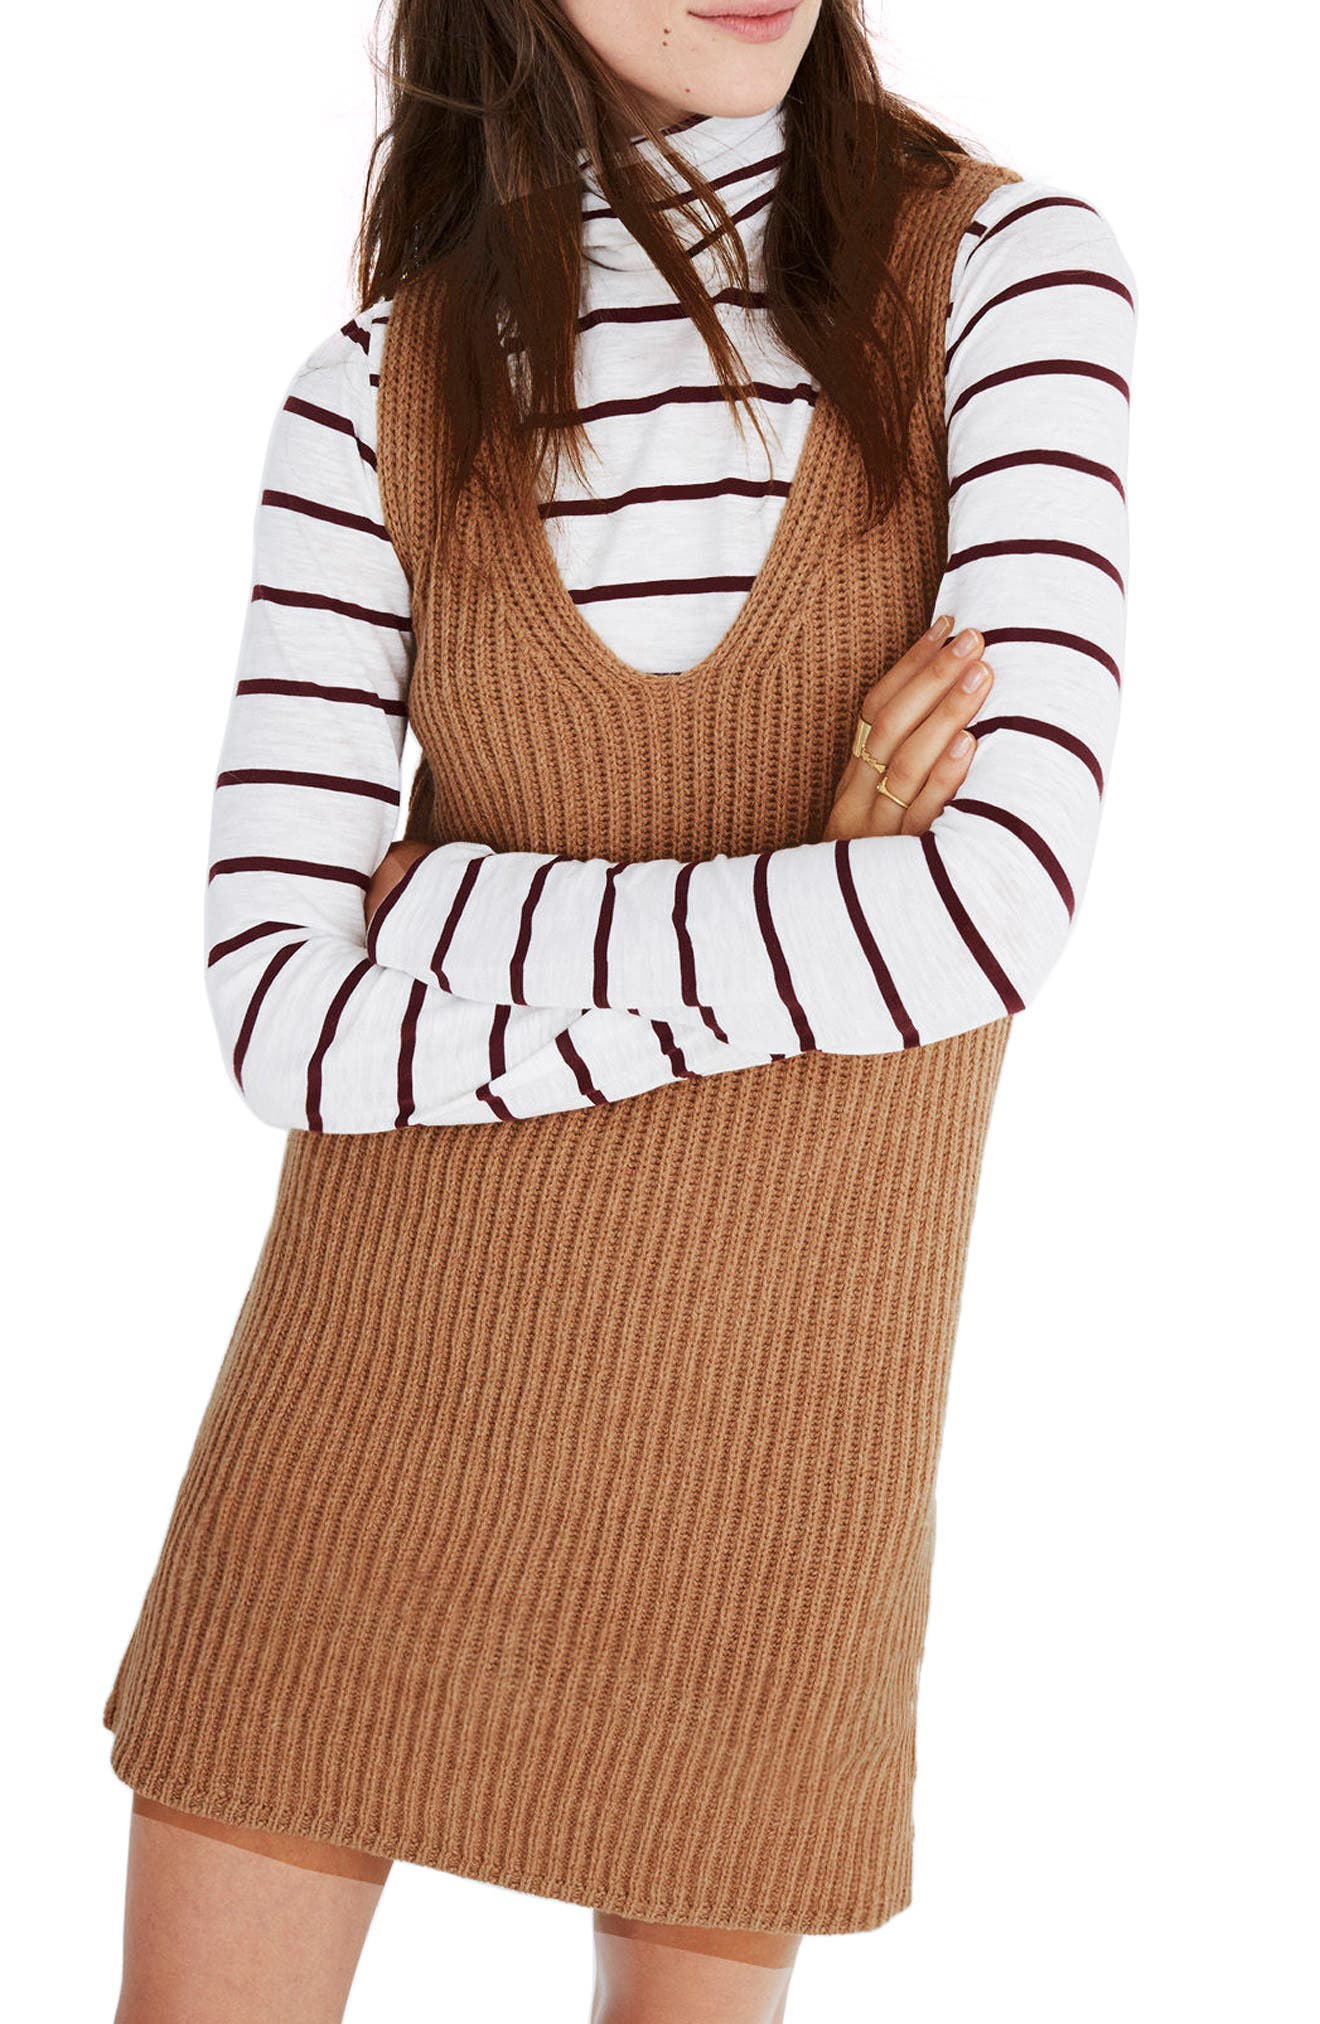 Alternate Image 1 Selected - Madewell Tunic Sweater Dress